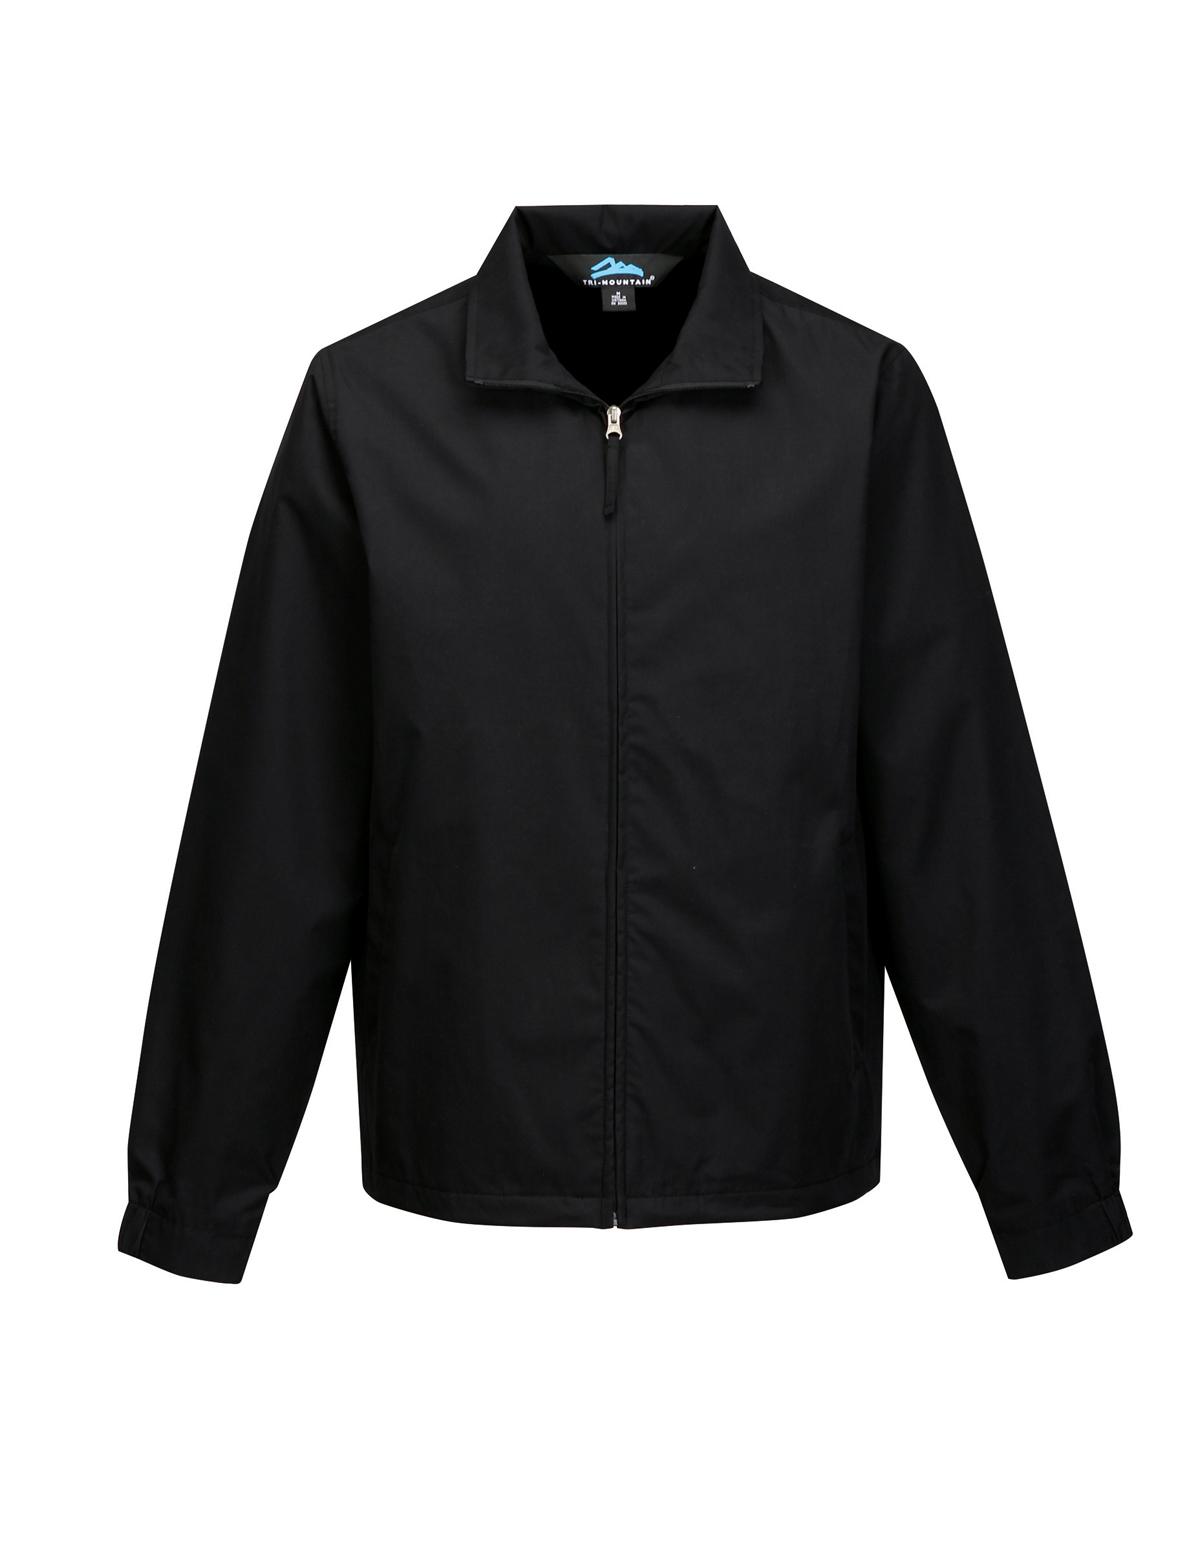 Tri-Mountain Radius J5308 Lightweight Windoroof Jacket, 2X-Large, Black/Black